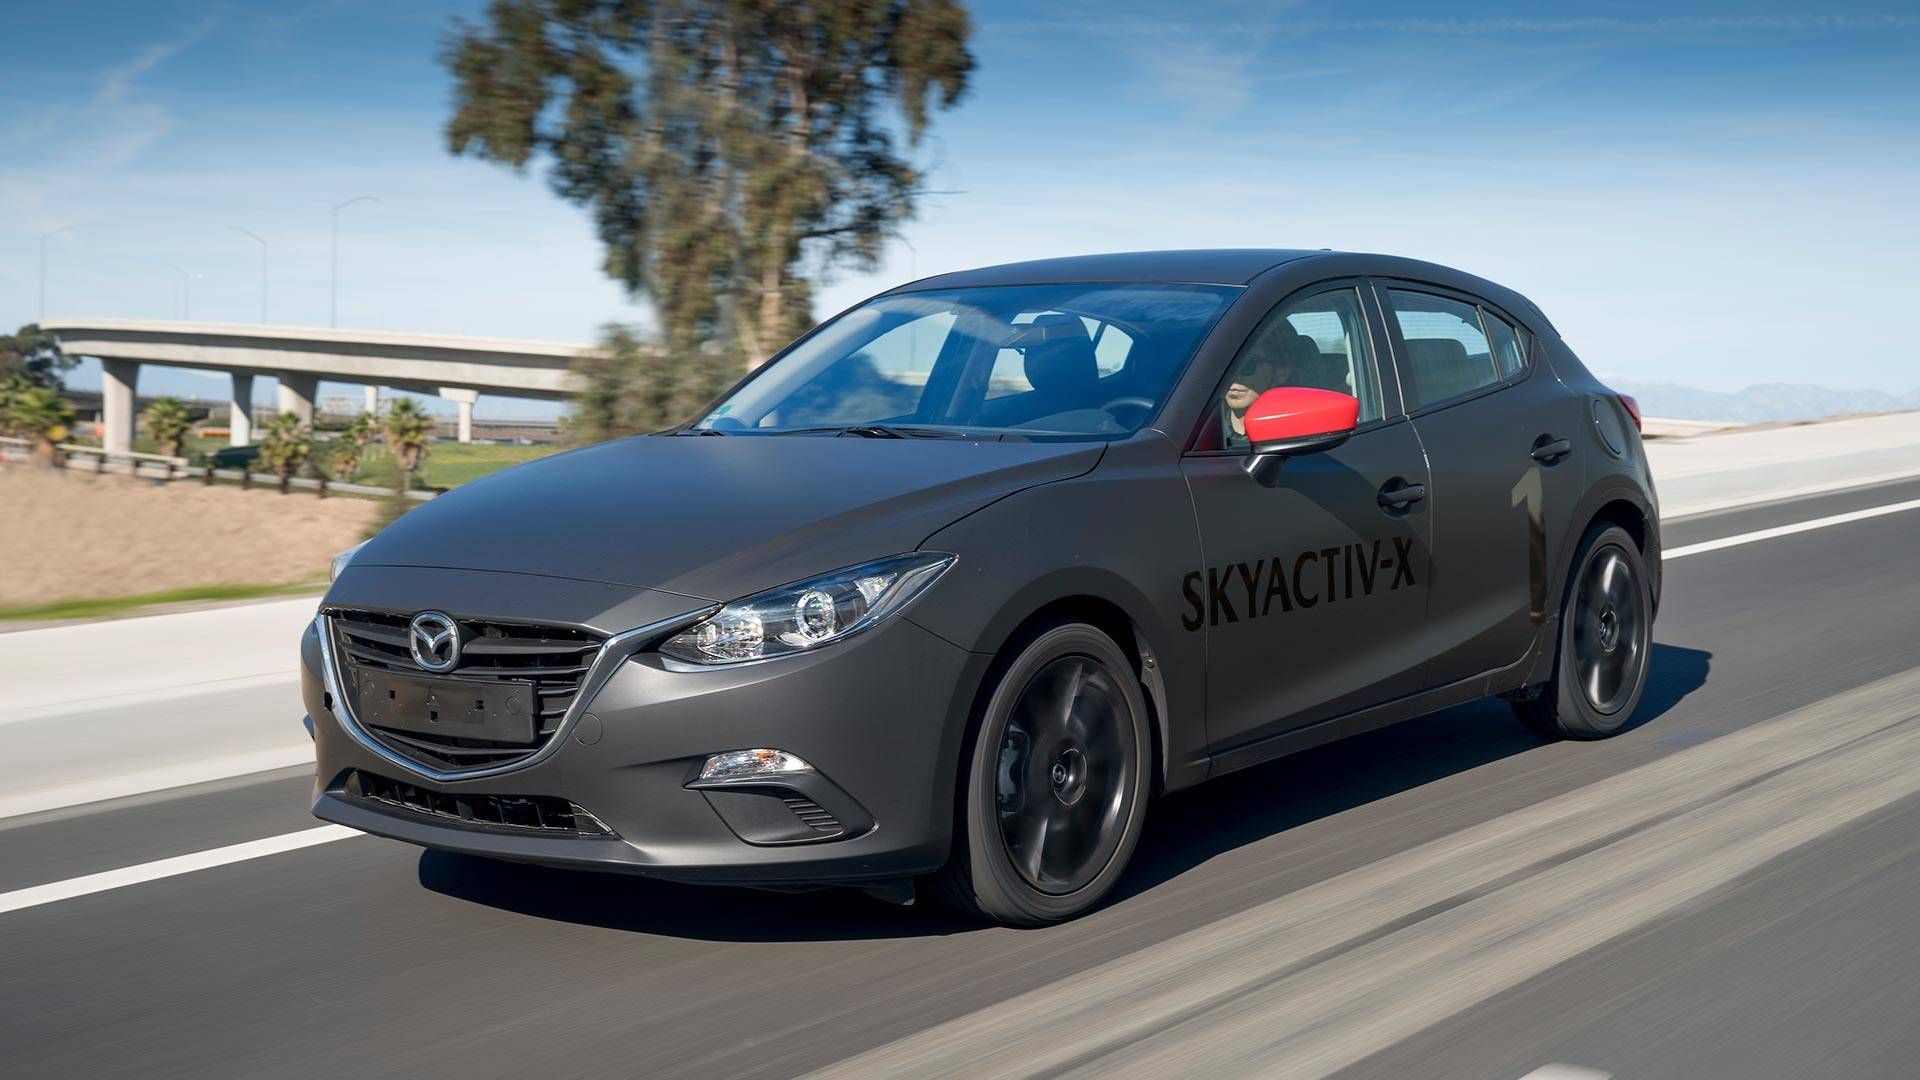 Mazda enjoying high demand for SkyActiv-X engine